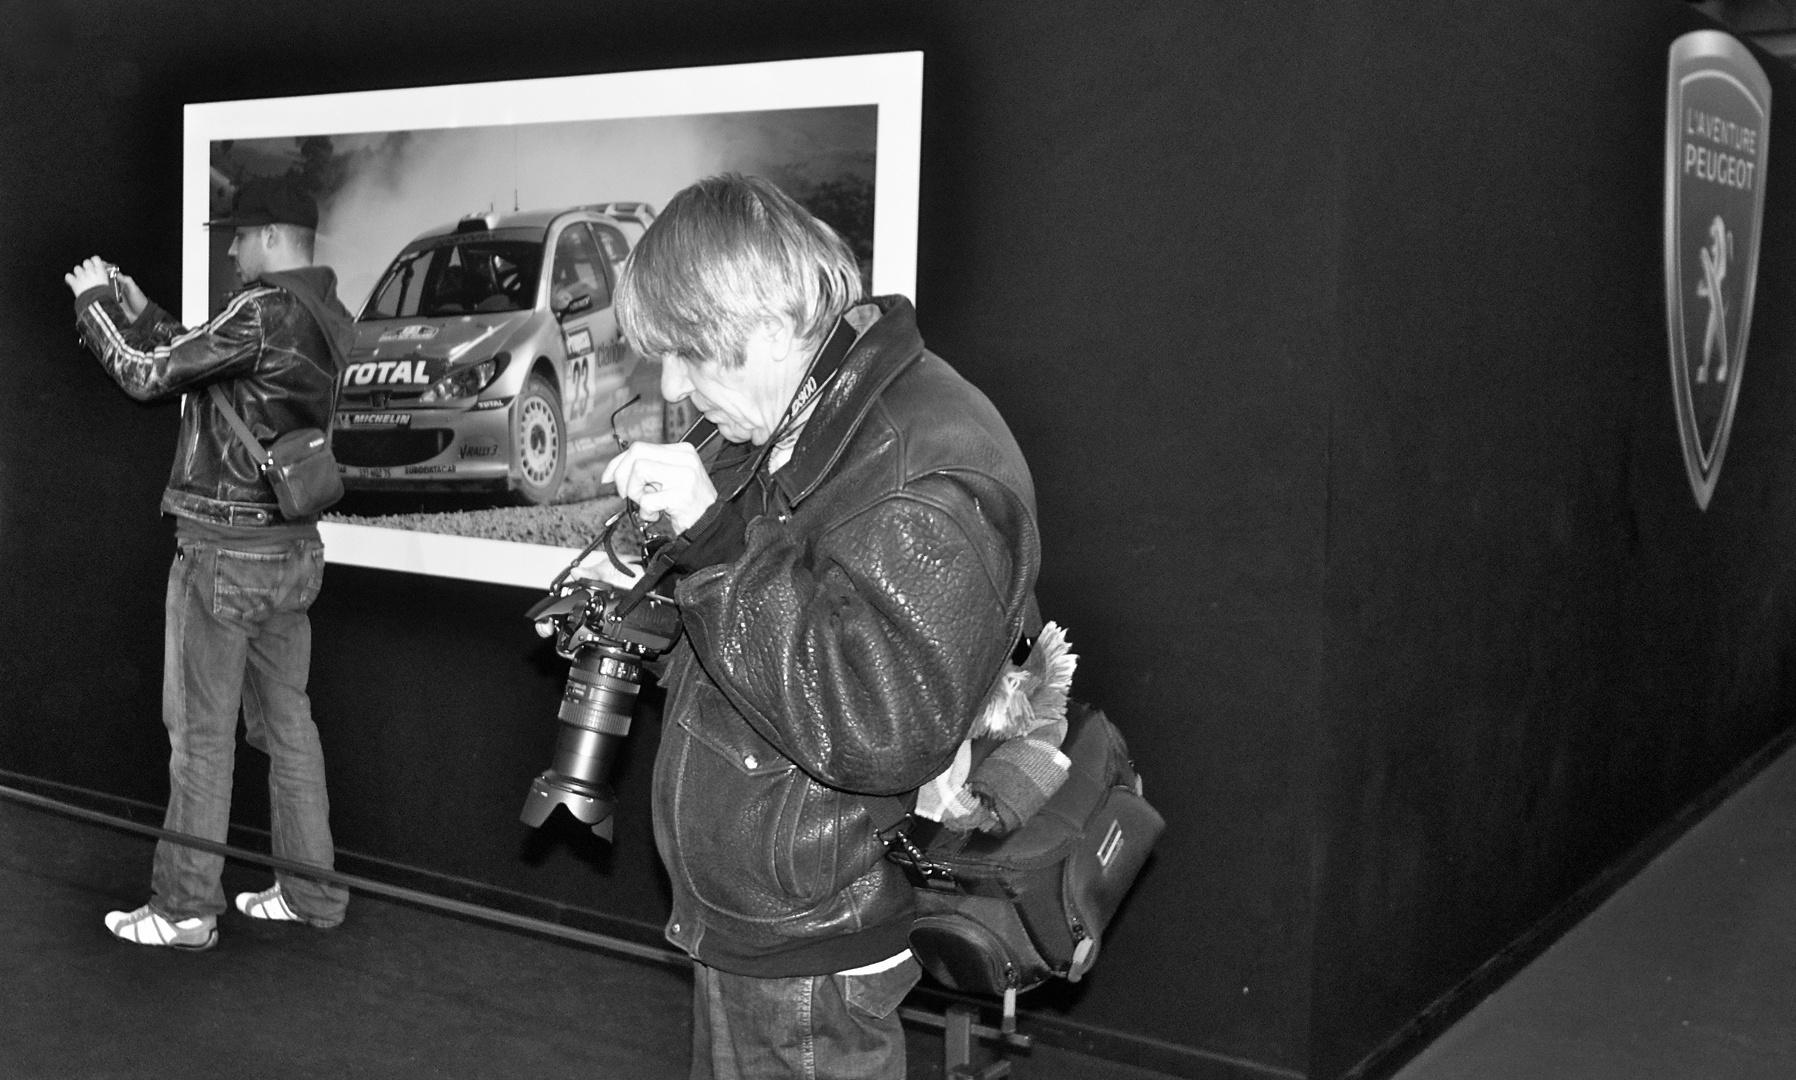 Fotographen in Aktion